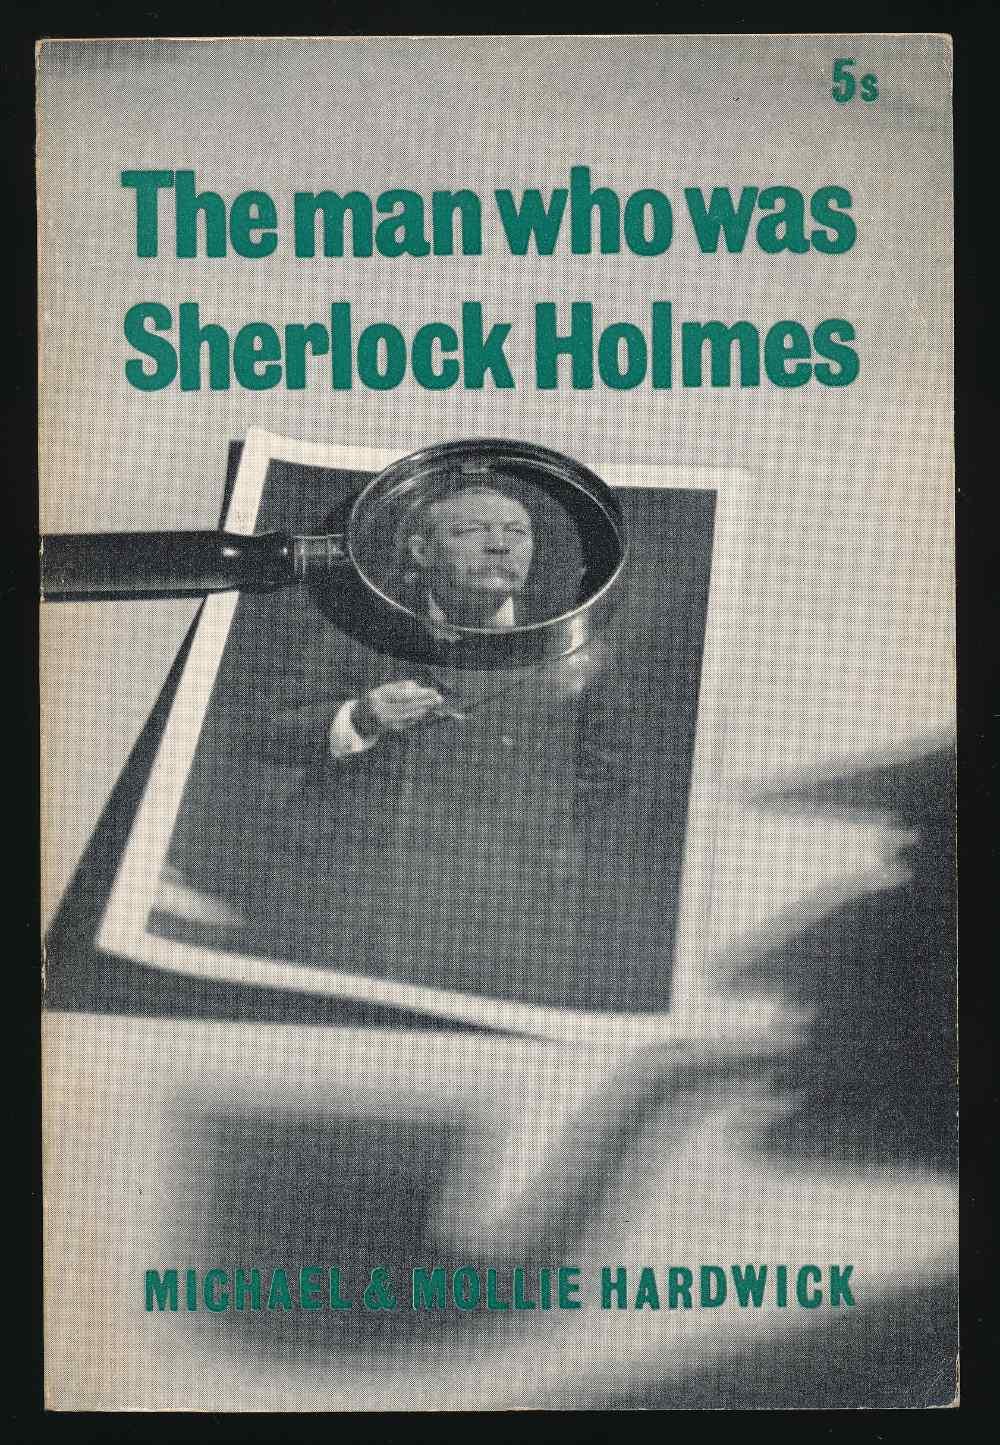 The man who was Sherlock Holmes